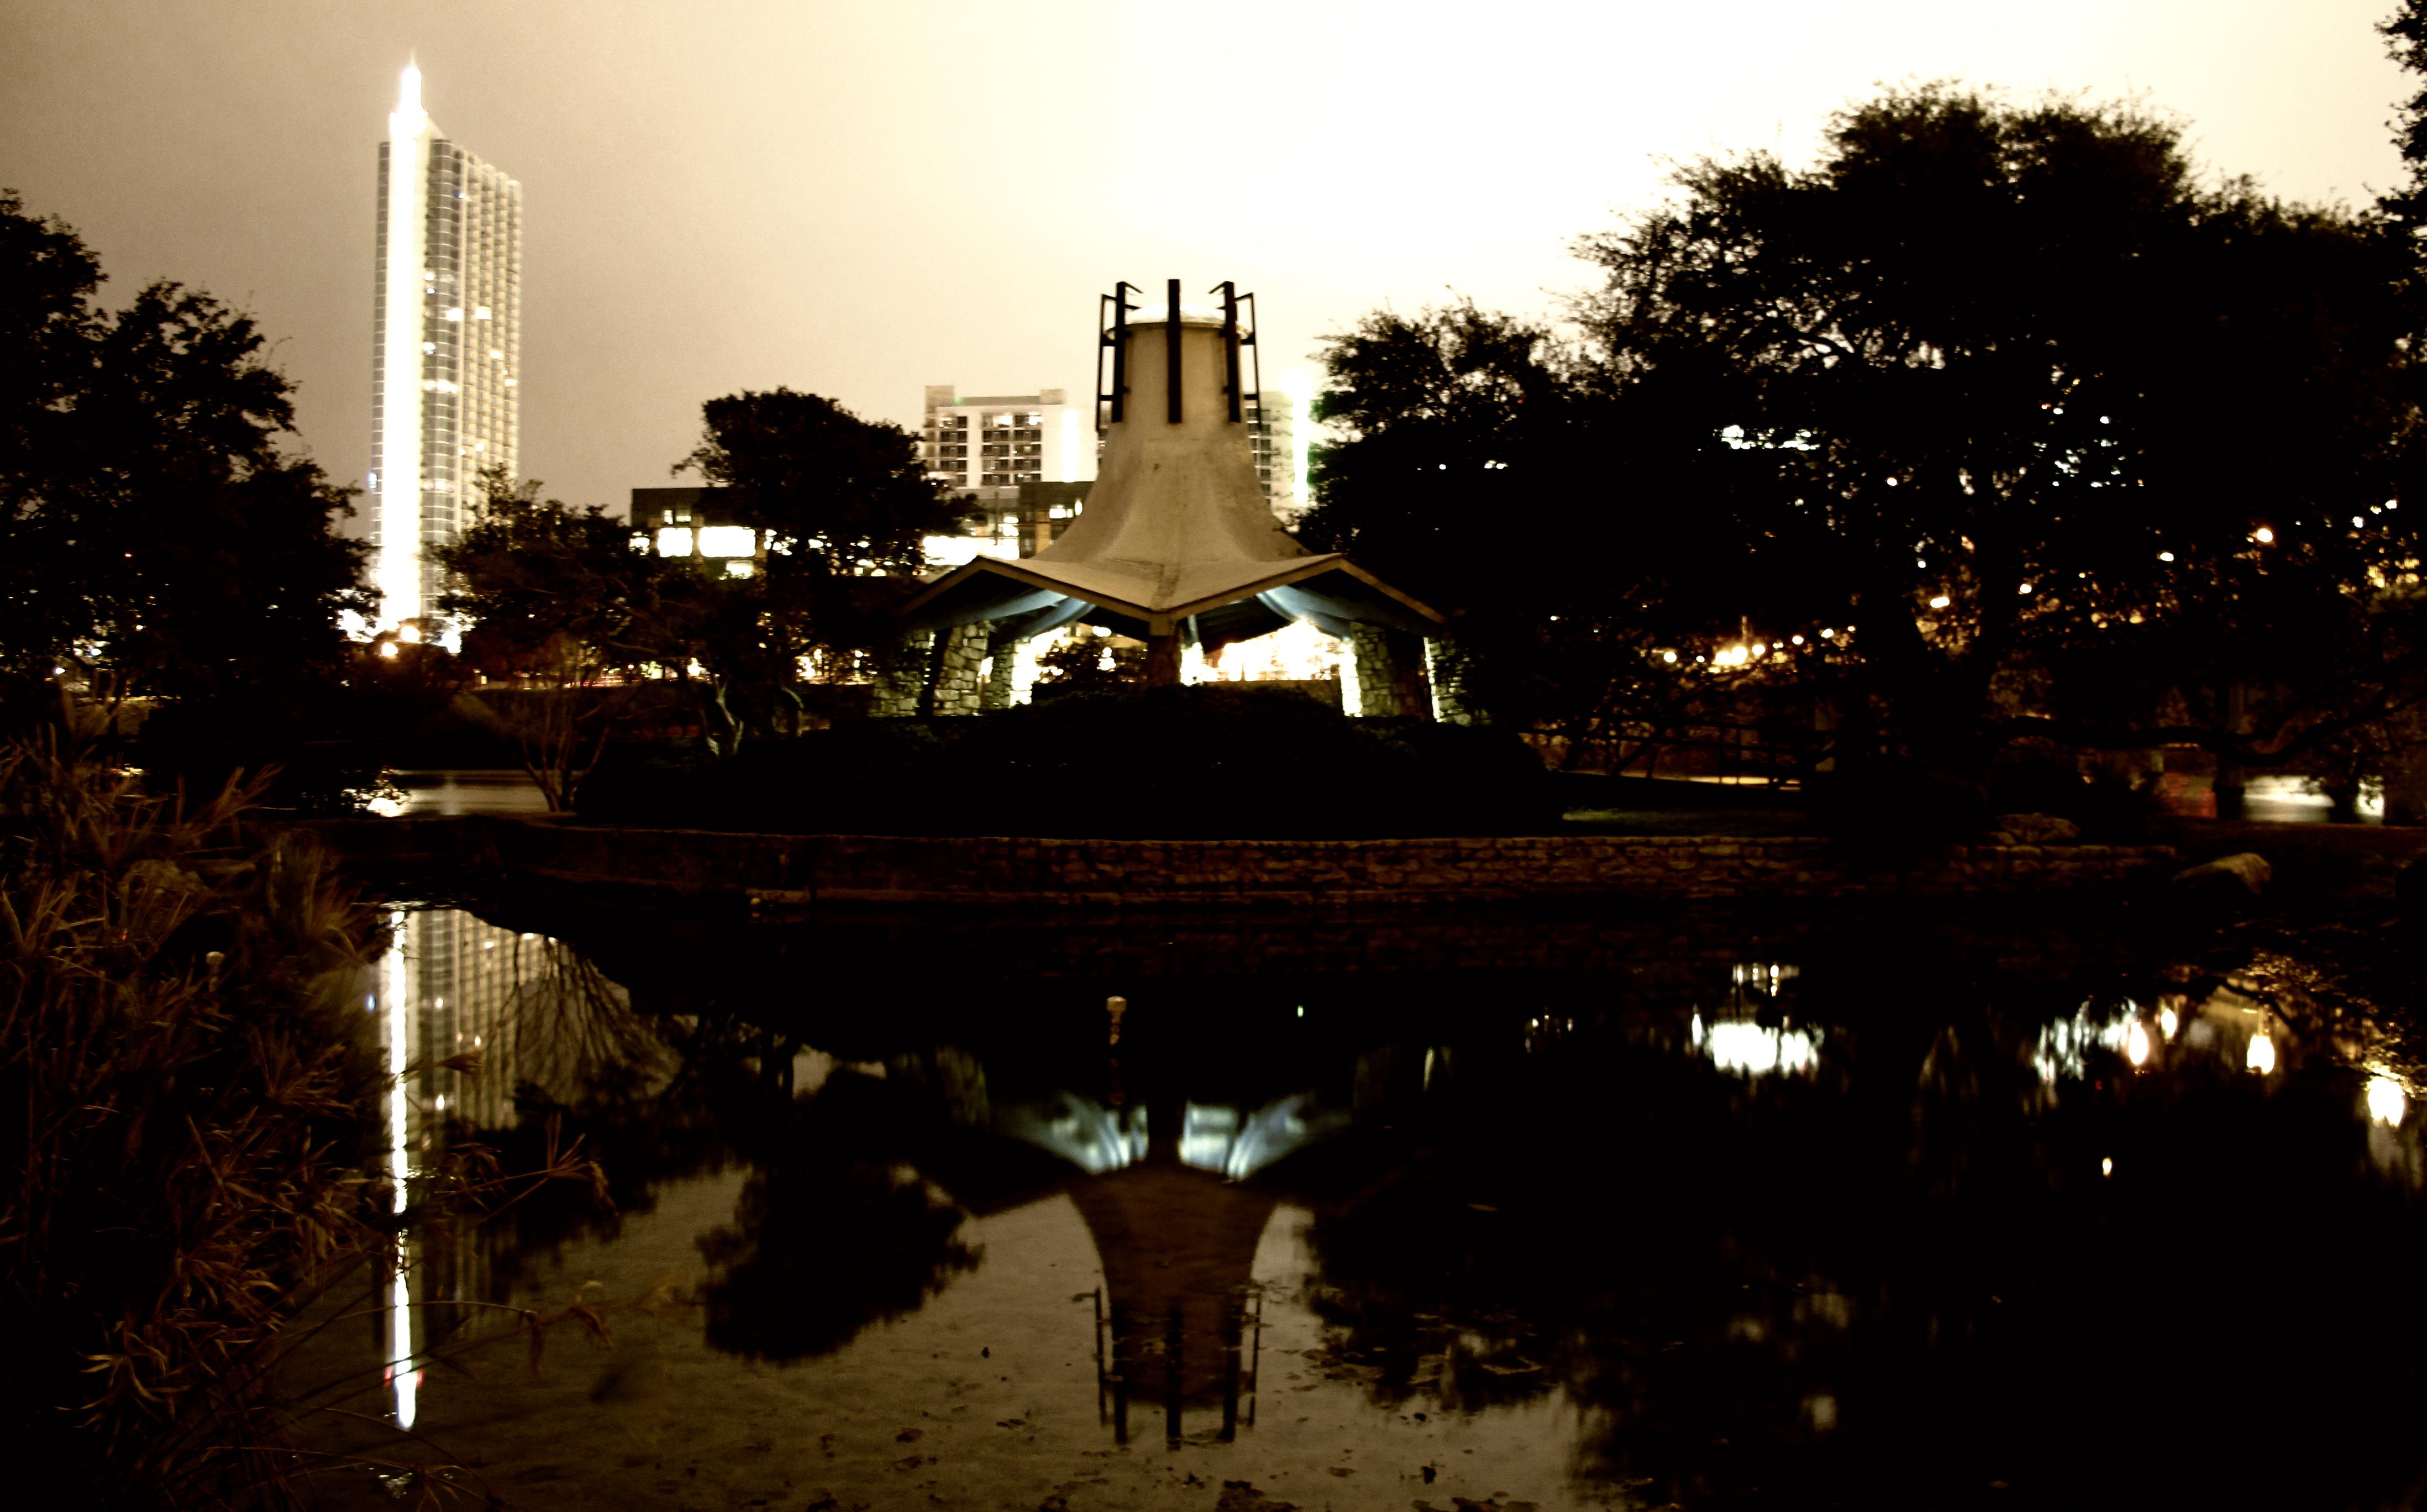 Pavilion & reflection photo